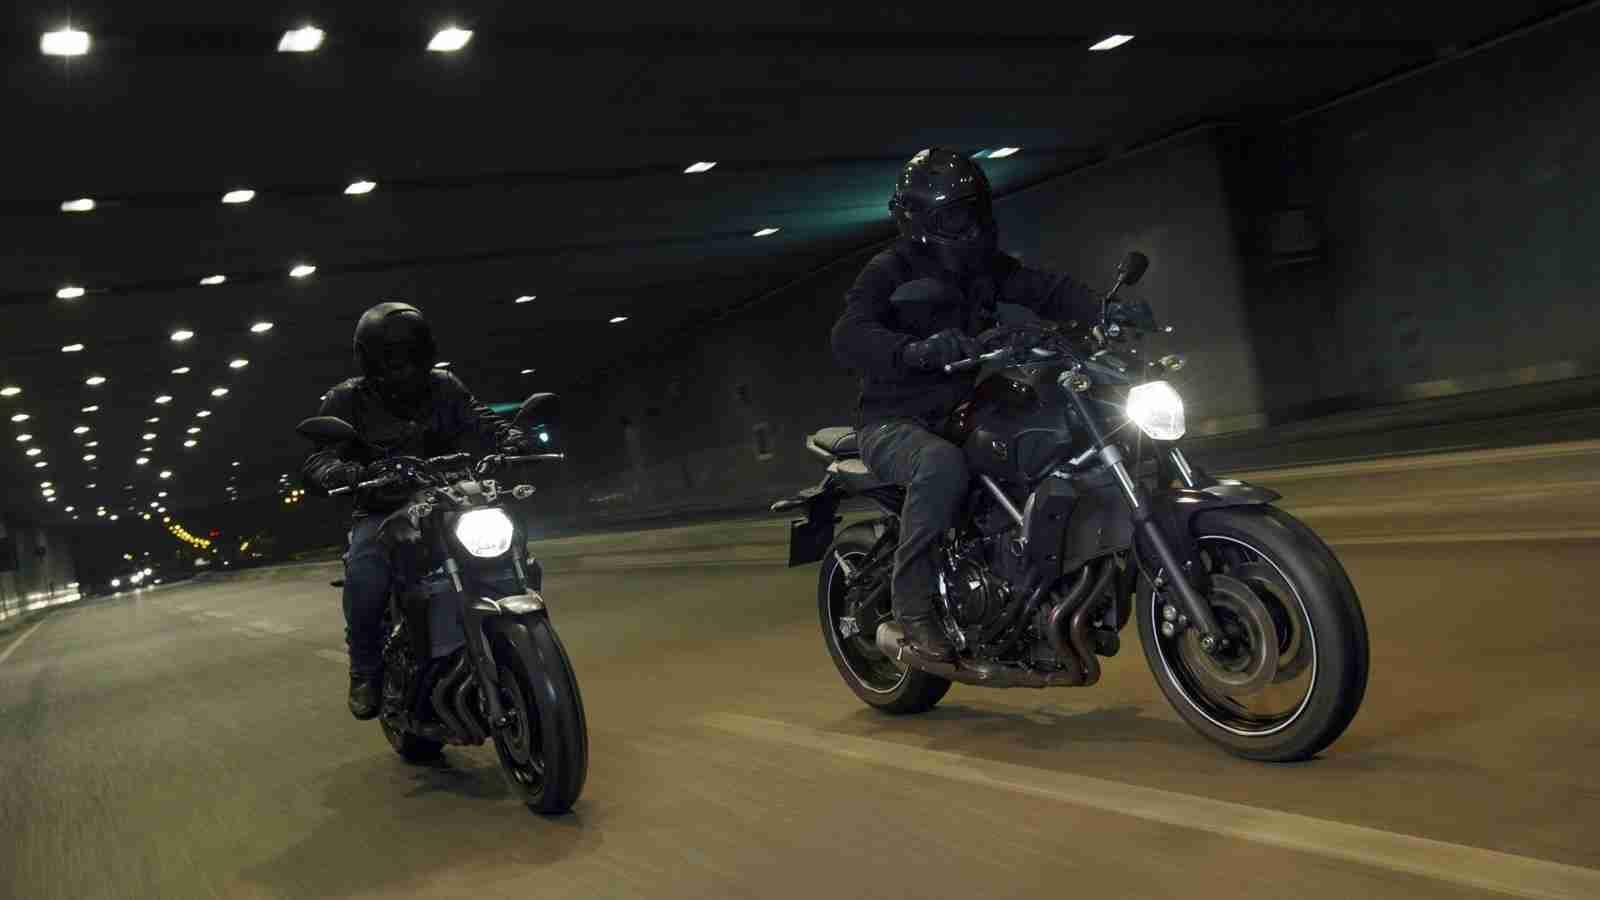 2014 Yamaha MT-07 - 08